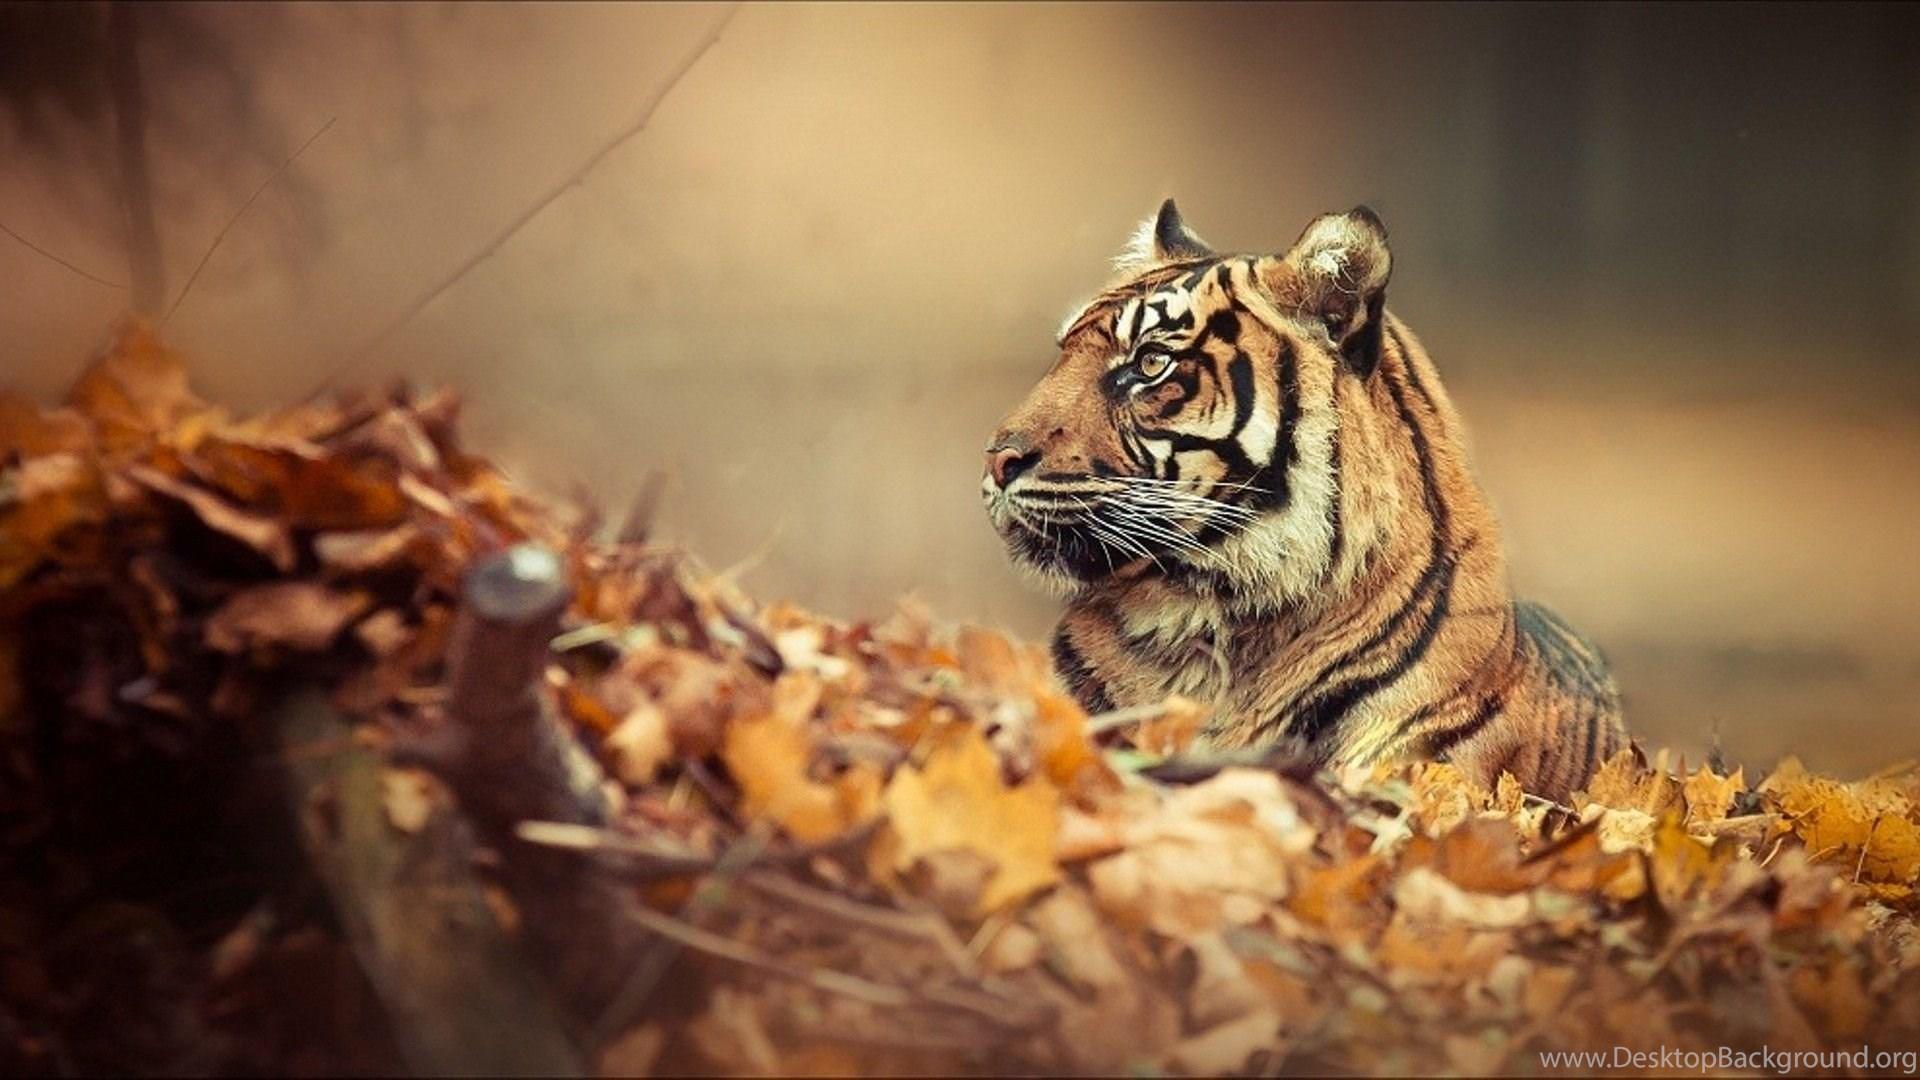 tiger wallpapers 3428 backgrounds cool wallnos desktop background